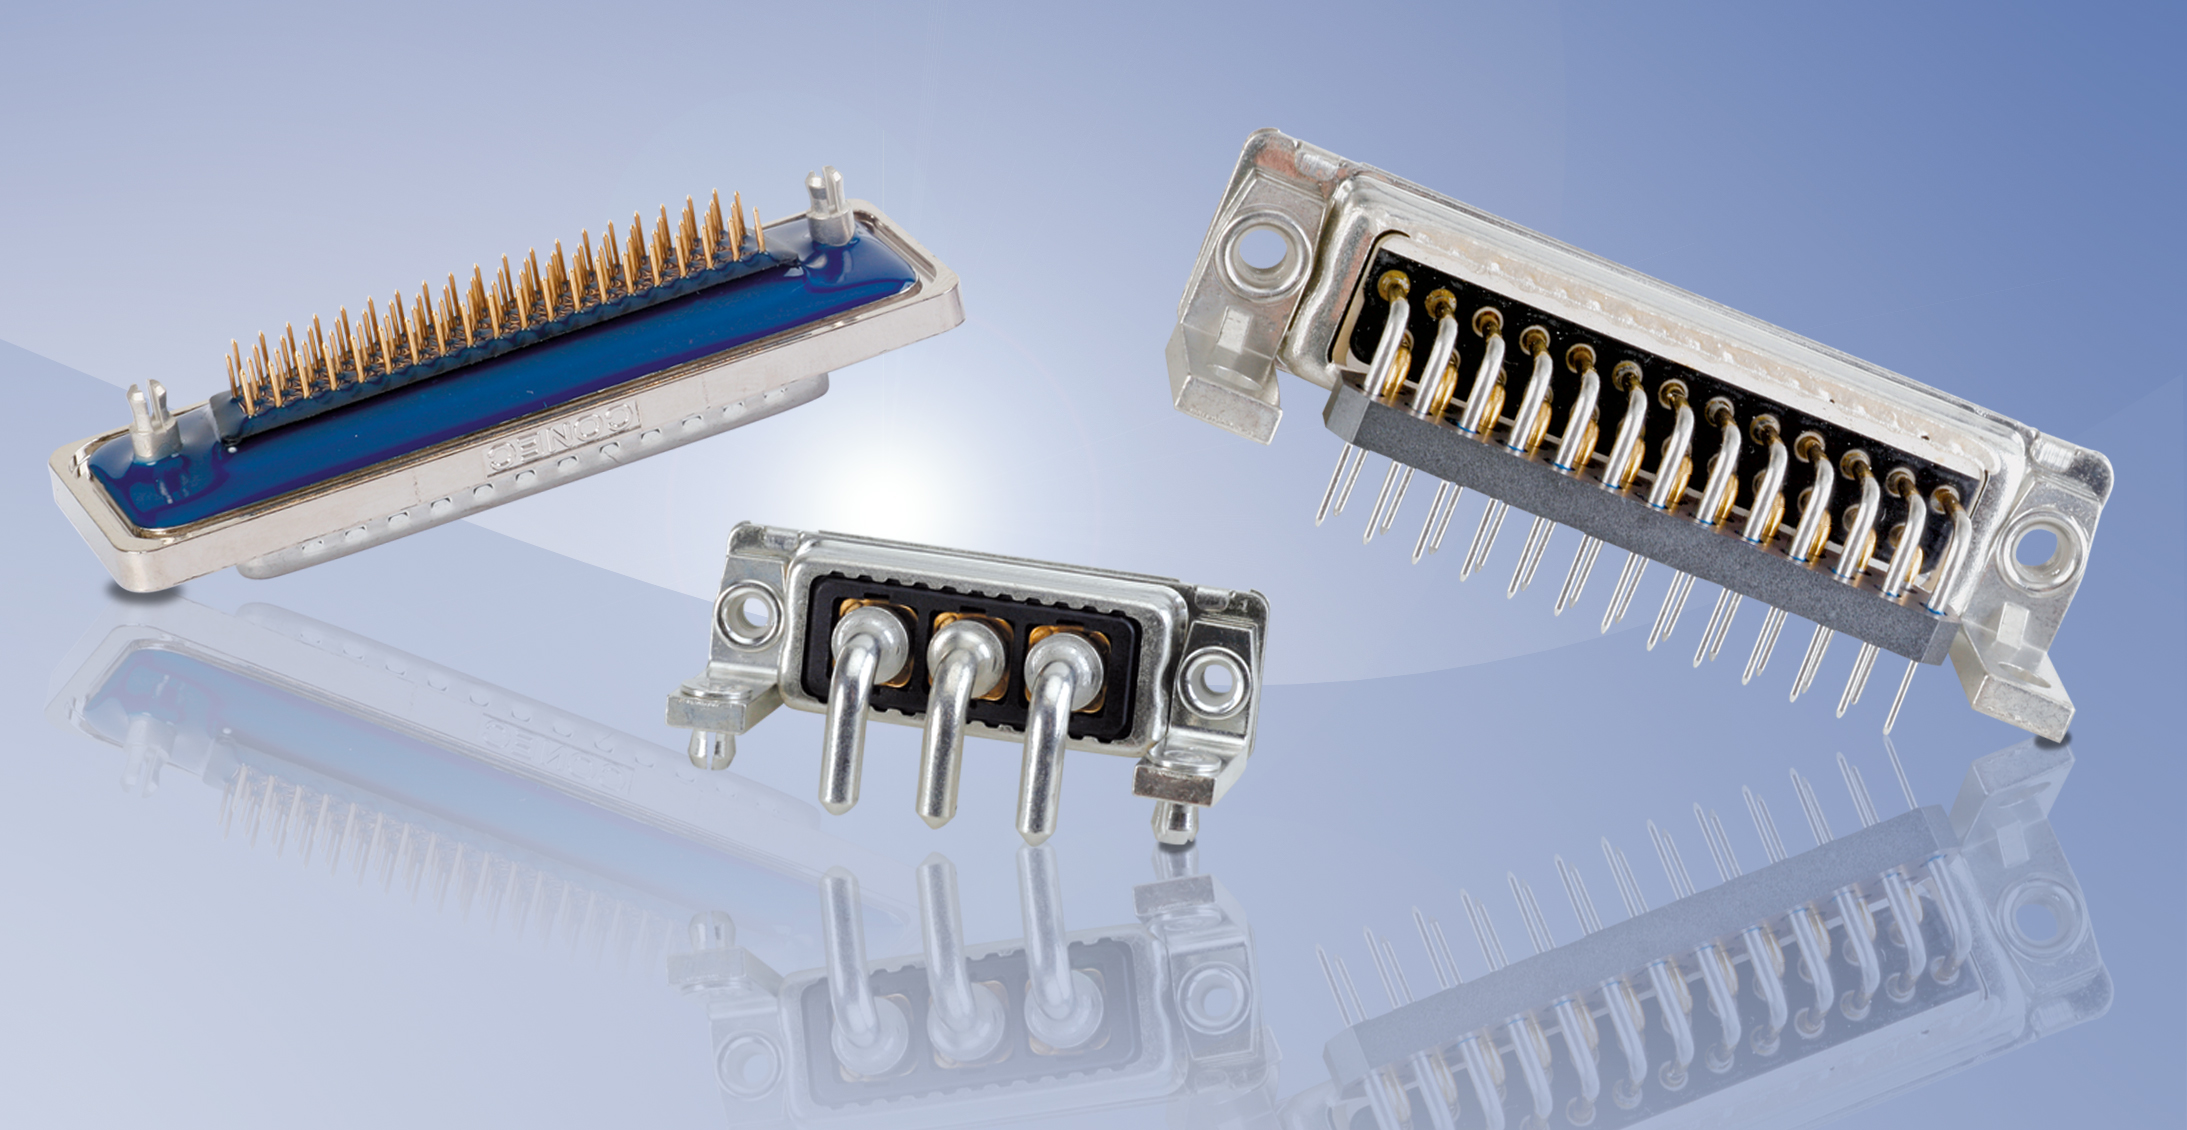 Conec The Specialist For D Sub Filter Connectors En Electronic Circuits Pressebild Filtersteckverbinder